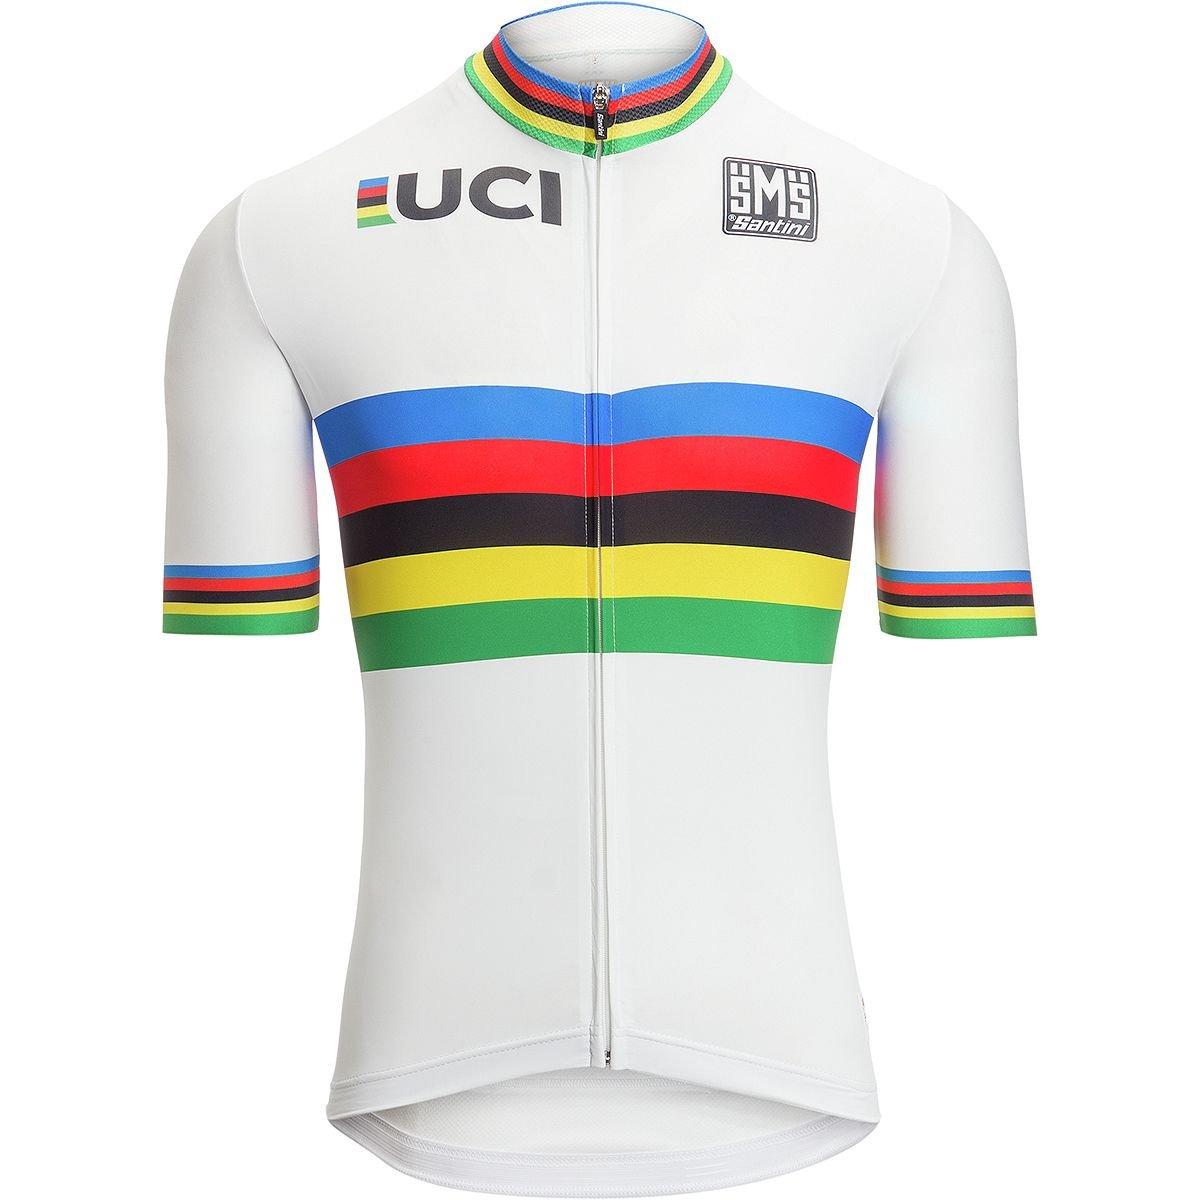 Santini UCI World Champion半袖Jersey – Men 's B079T3DVKC  1色 Medium